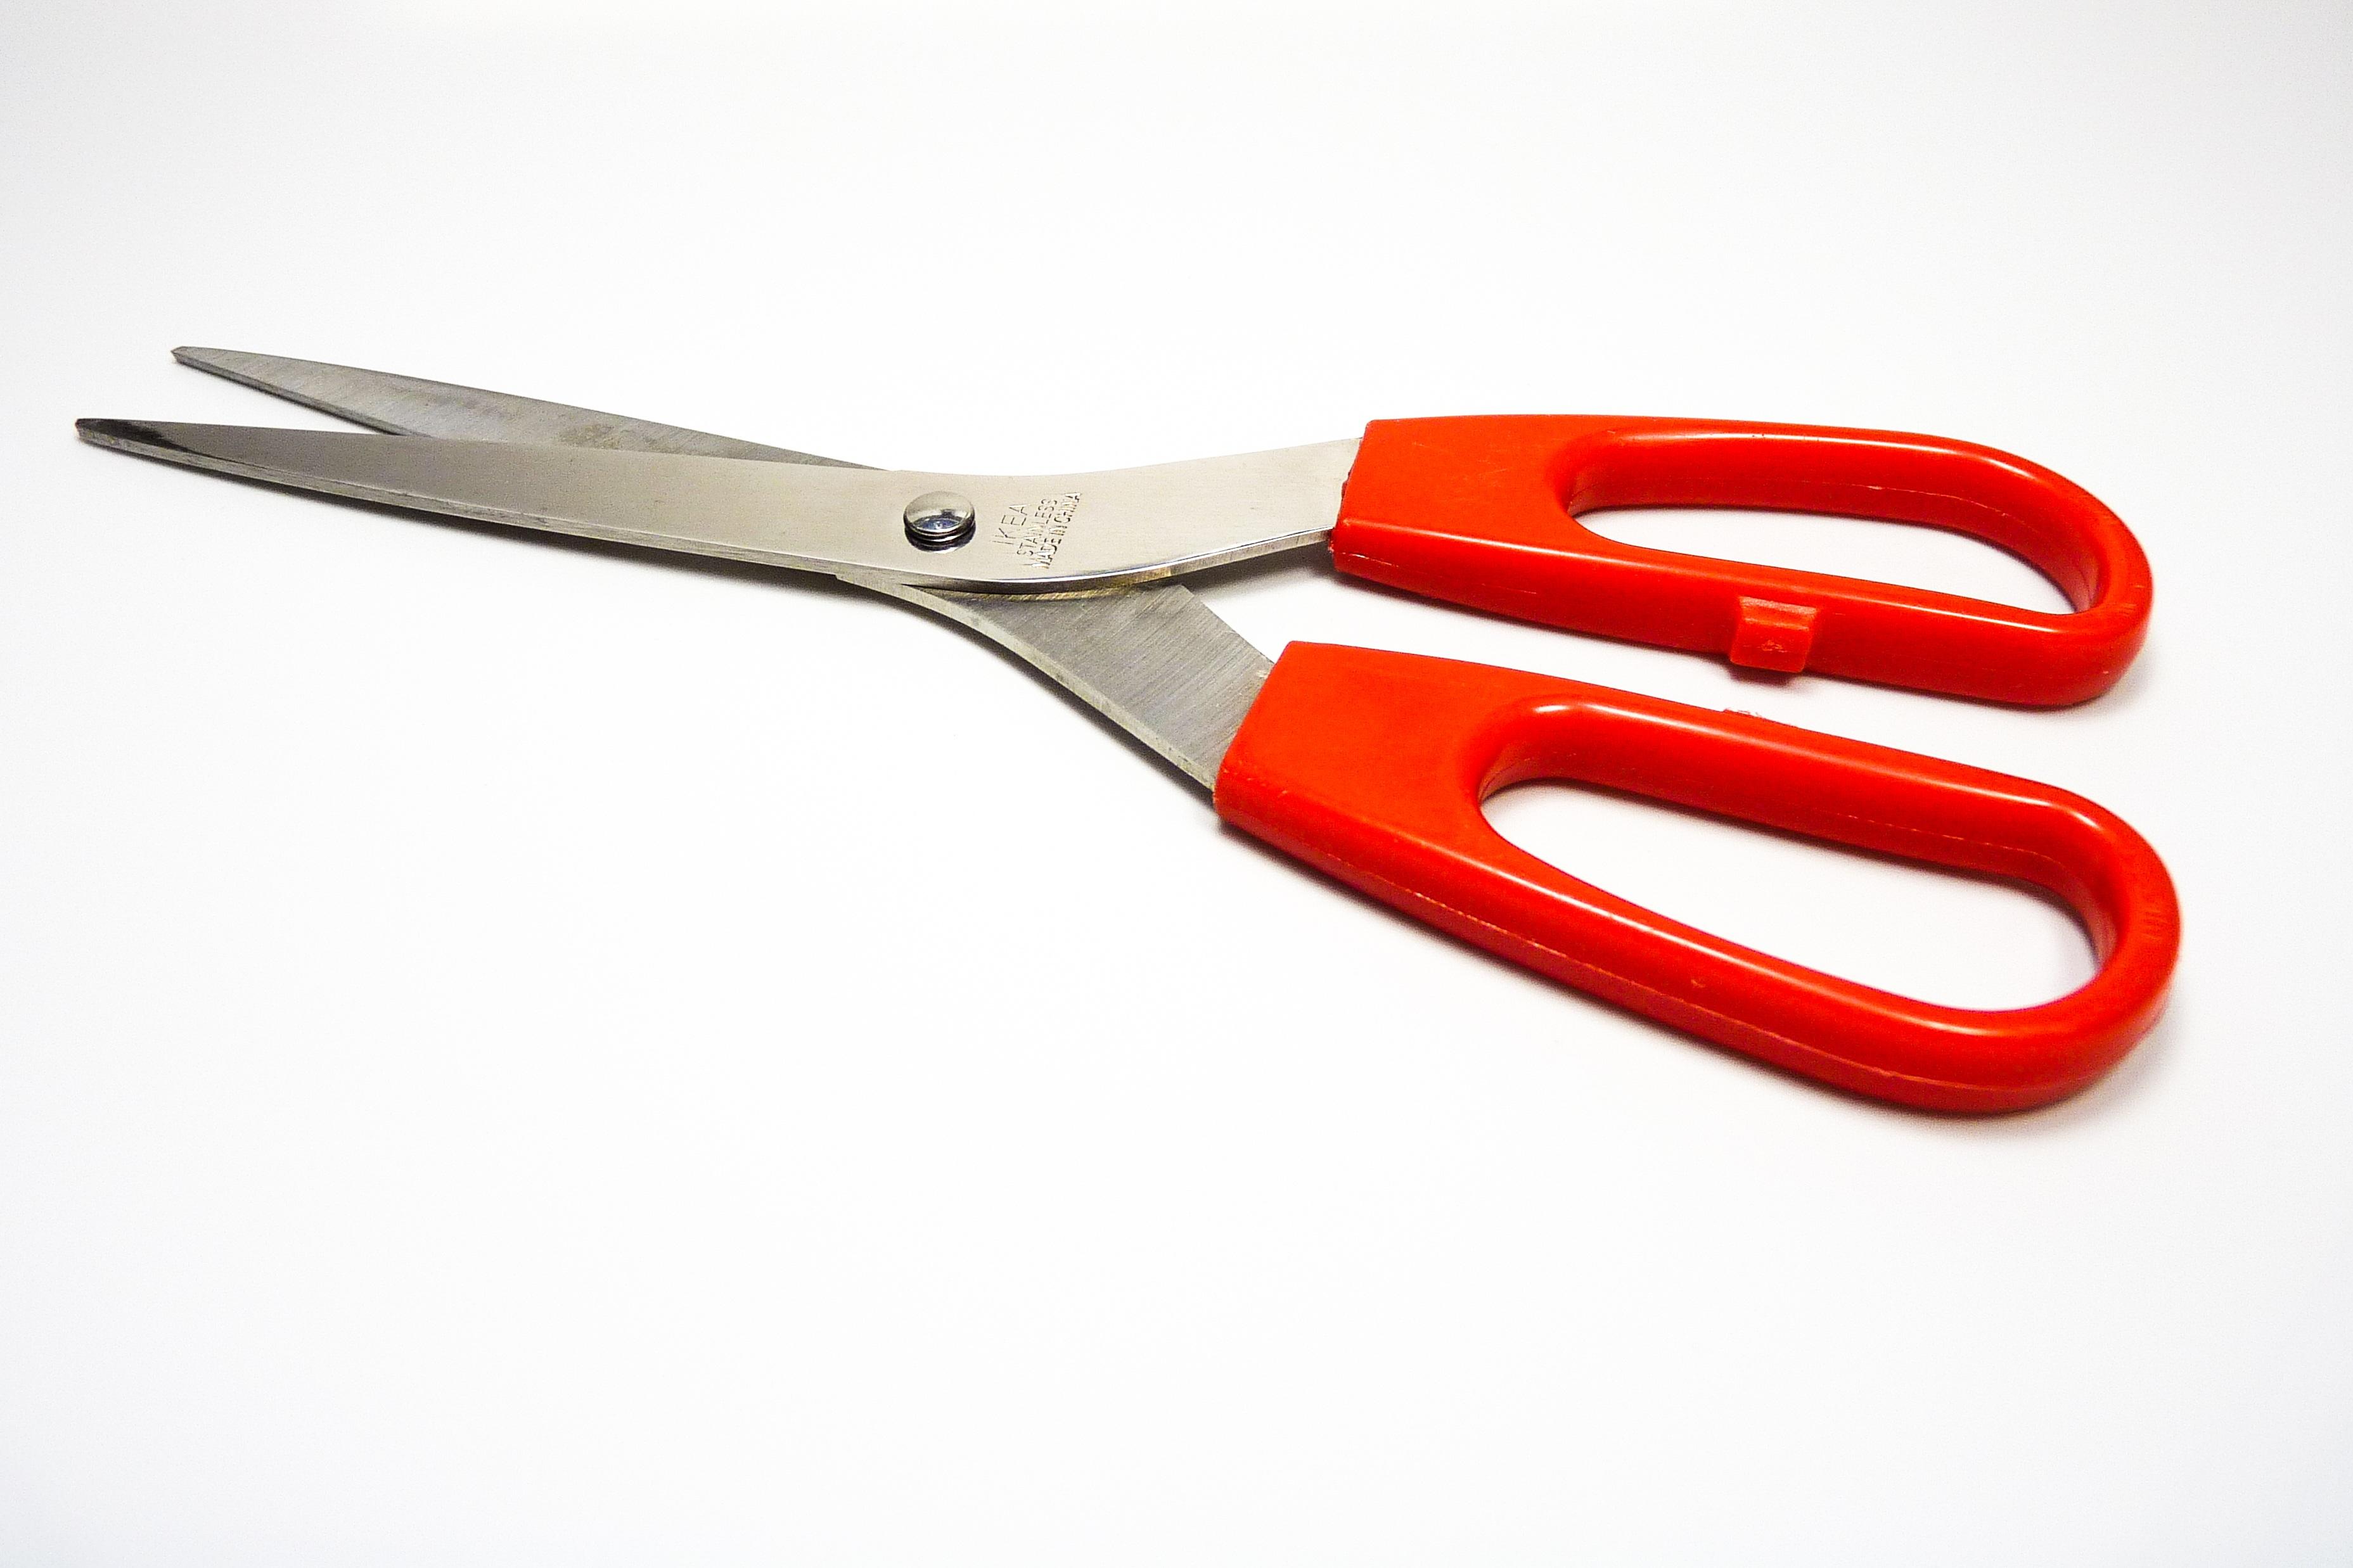 Perkakas Tajam Alat Merah Peralatan Dapur Memotong Tang Gunting Hidung Jarum Diagonal